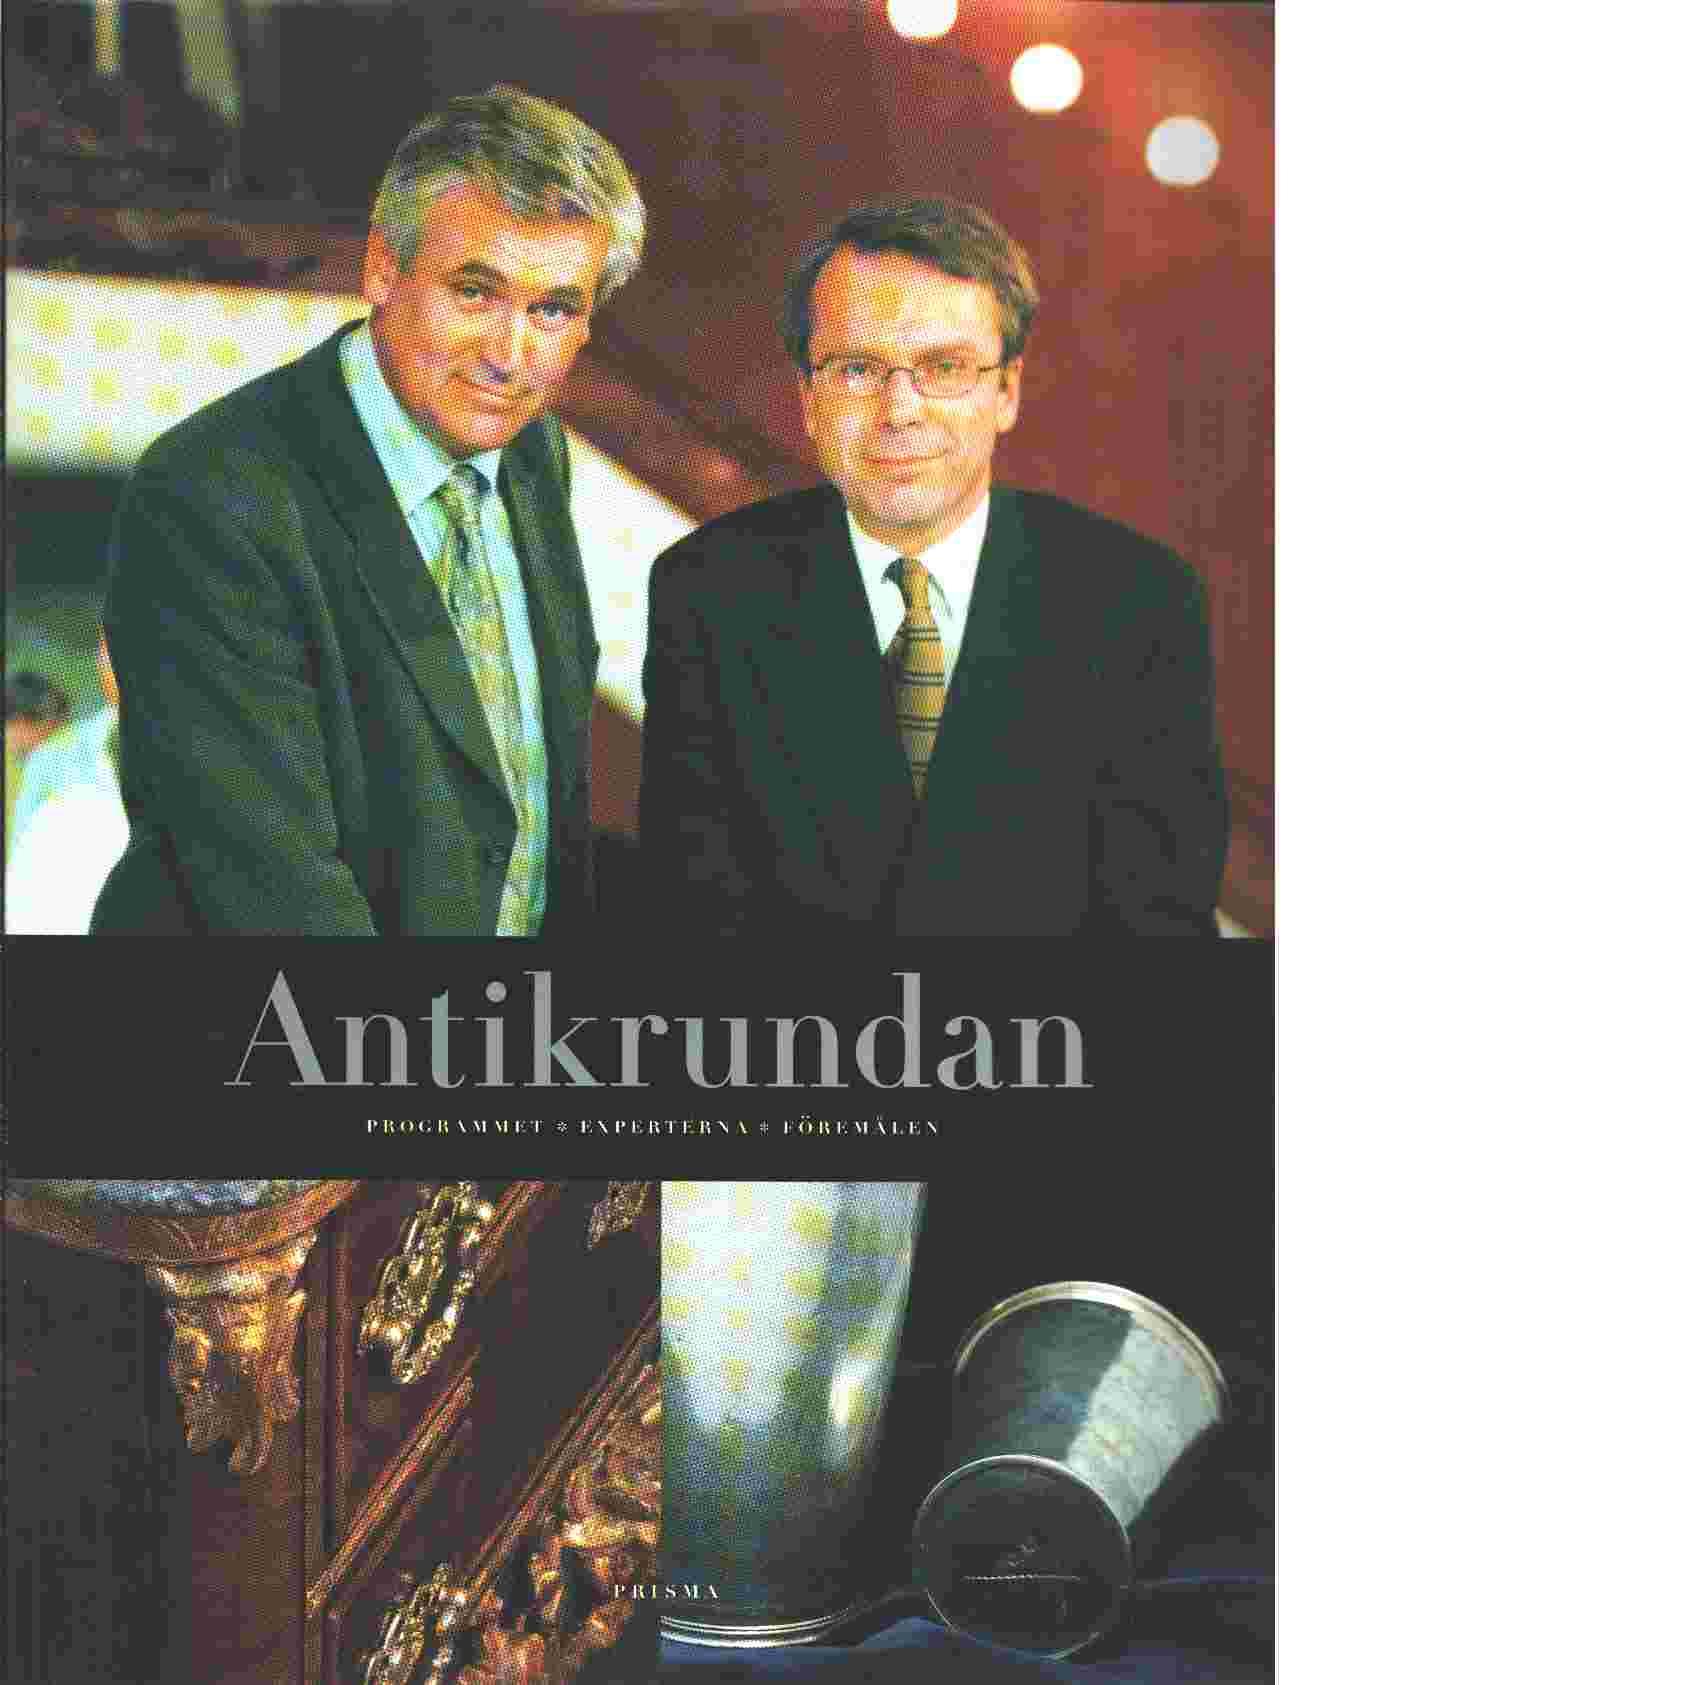 Antikrundan : programmet, experterna, föremålen - Janson, Bengt